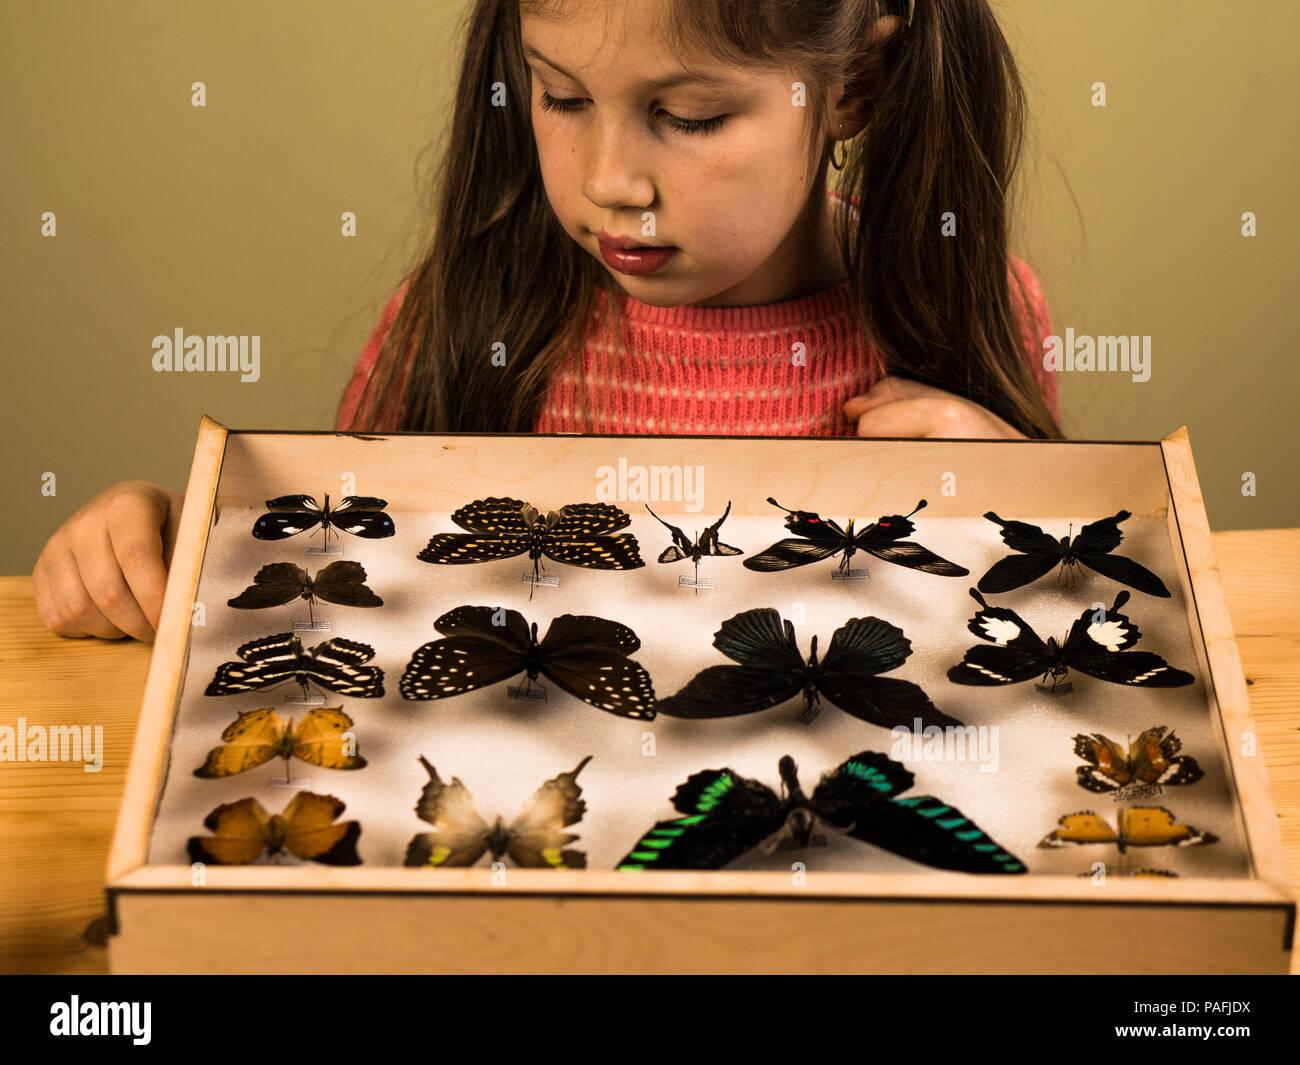 Little Girl Scrutinizes Entomology Collection of Tropical Butterflies - Stock Image